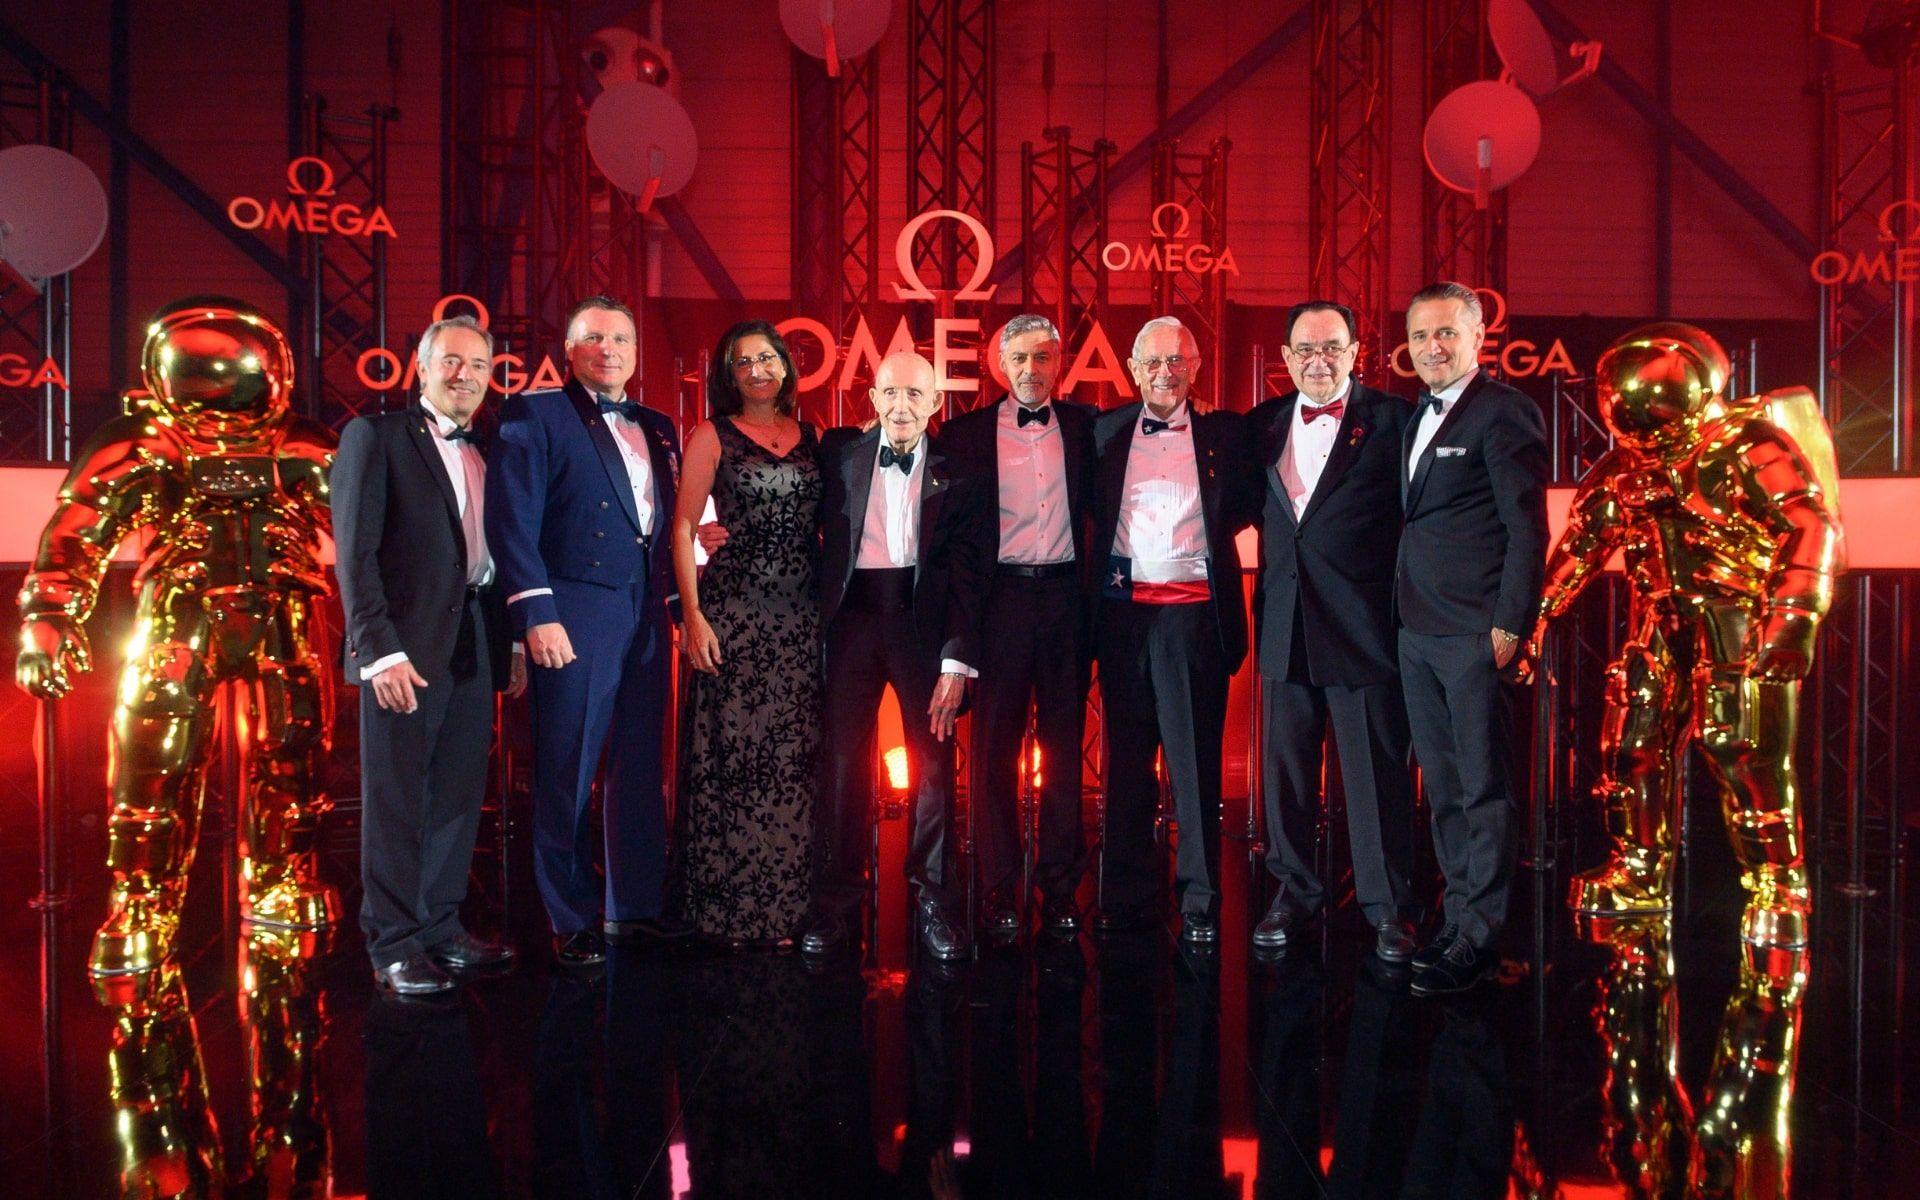 Jean-François Clervoy, Terry Virts, Nicole Stott, Thomas Stafford, George Clooney, Charlie Duke, James Ragan and Raynald Aeschlimann